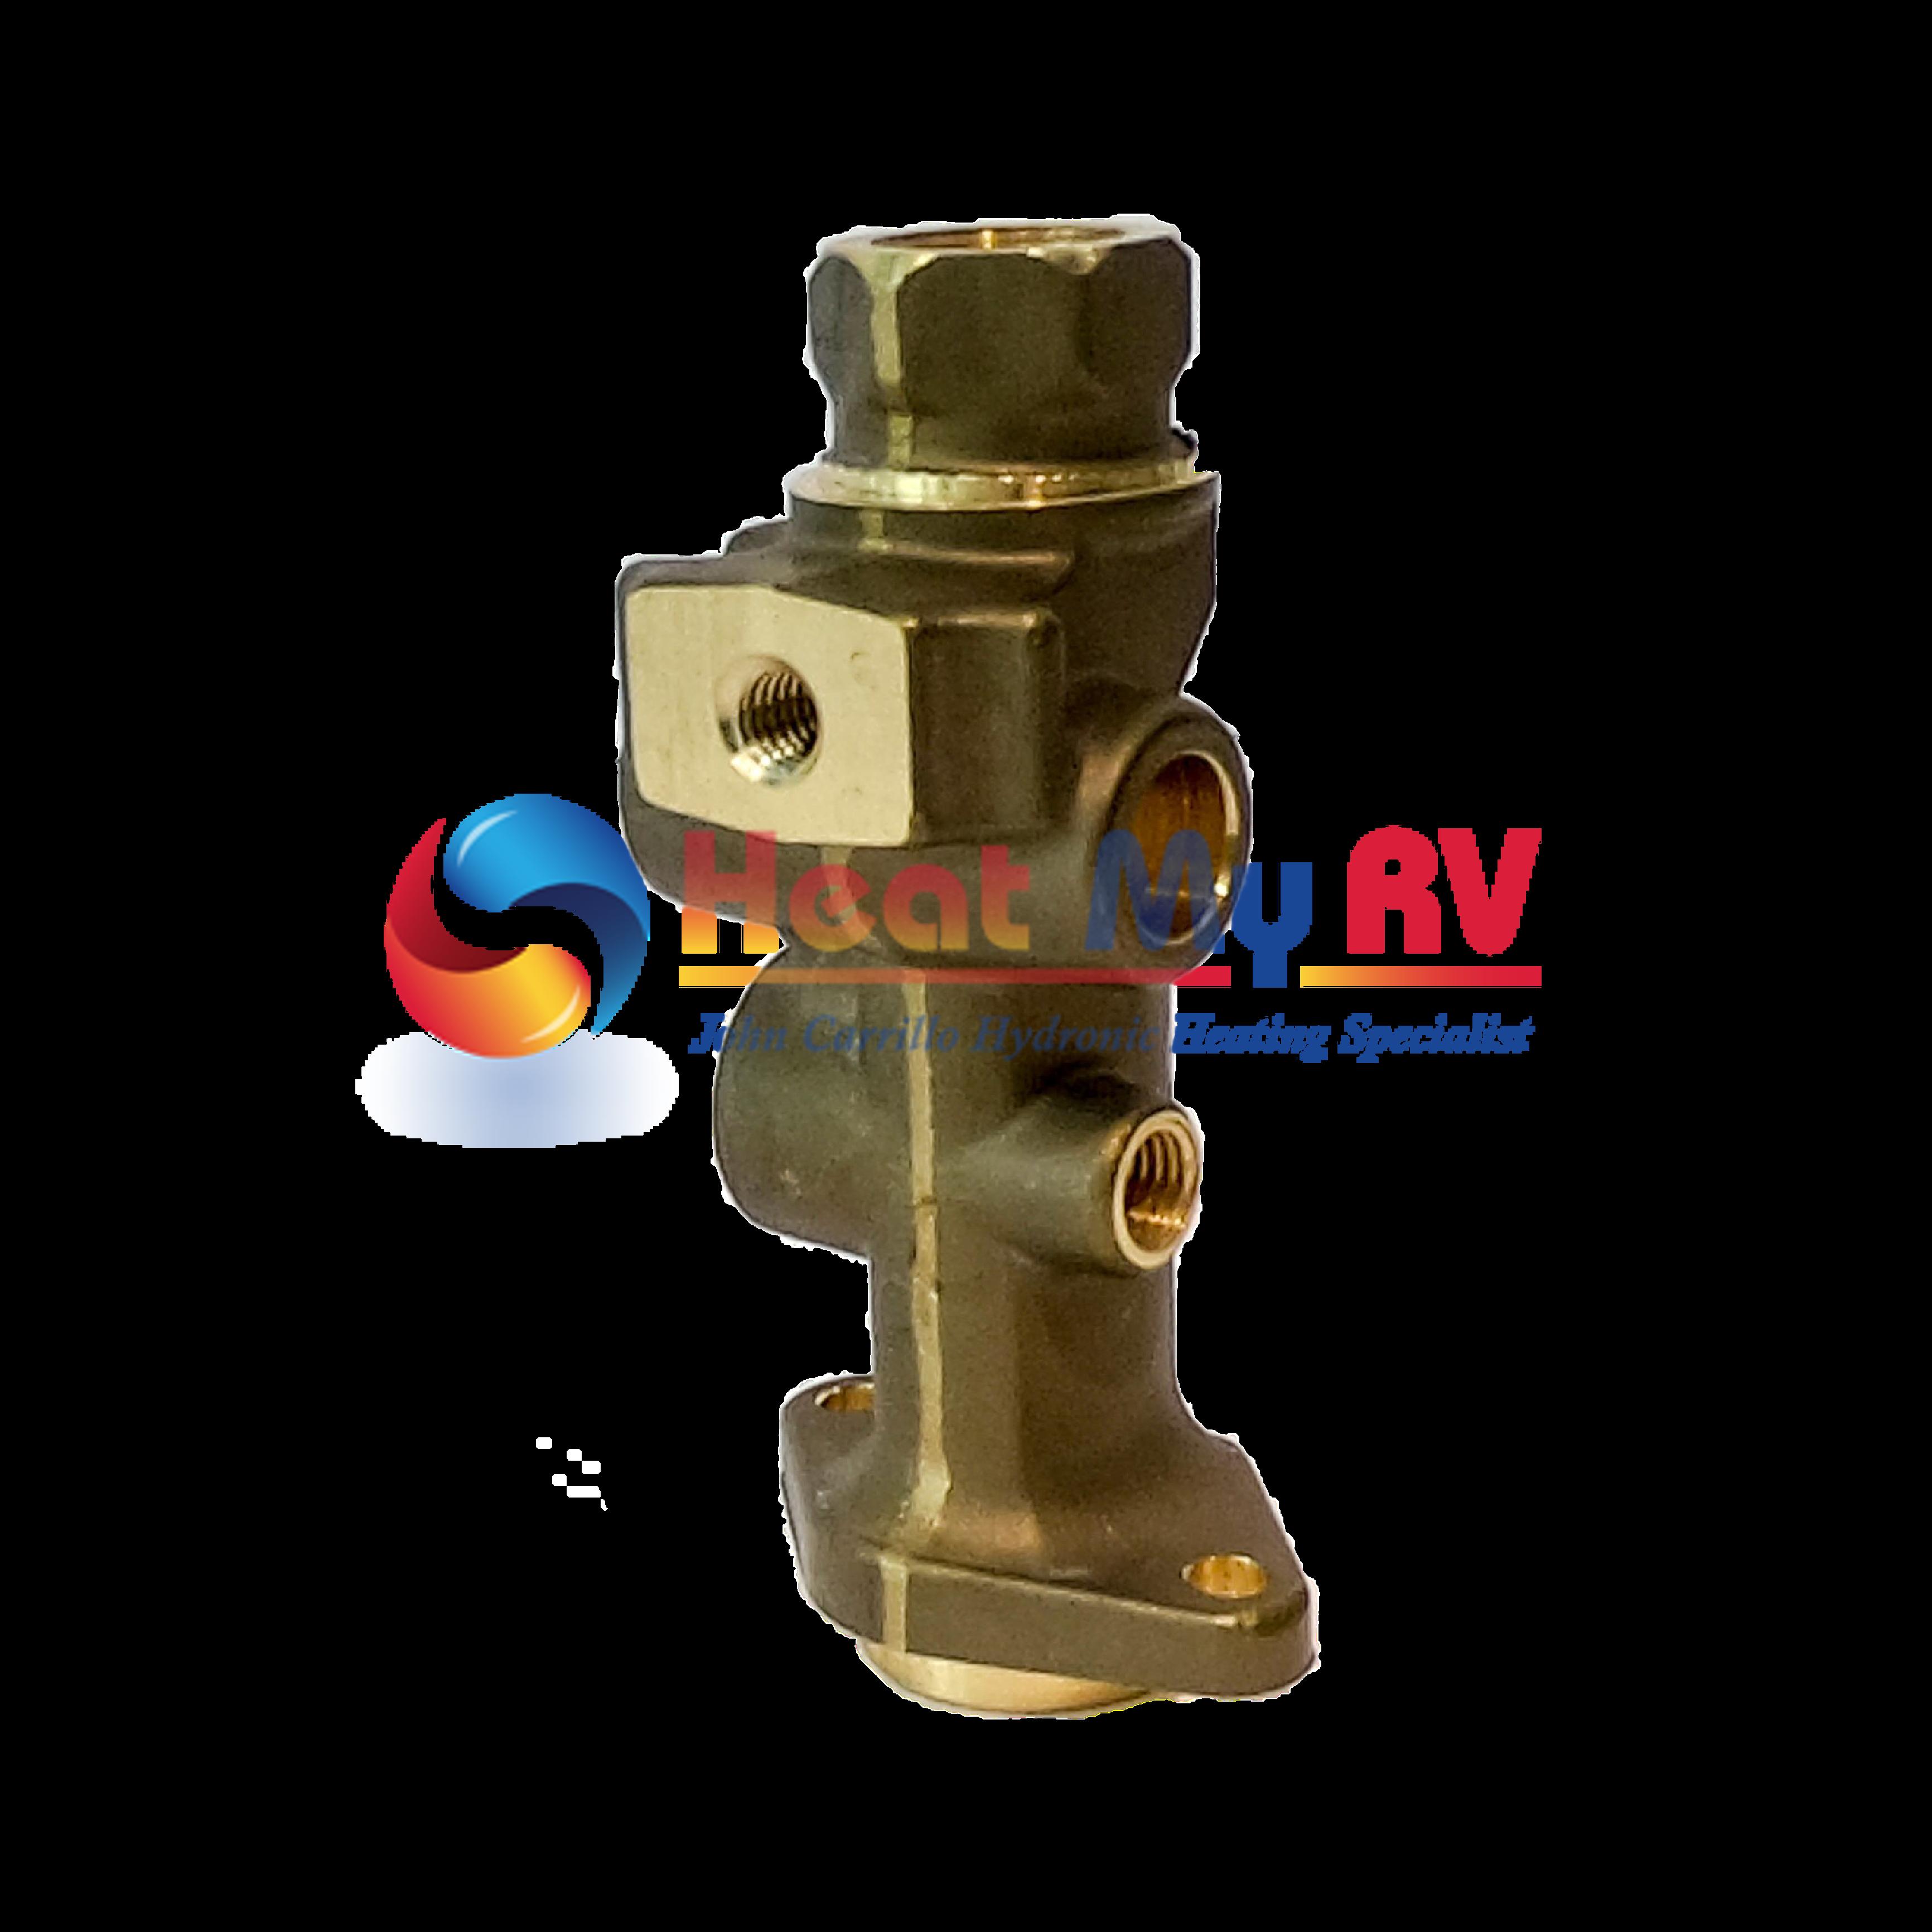 Nozzle Stand, Webasto DBW 2010-300 - Aqua Hot RV Hydronic Heating -  WPX-412-198